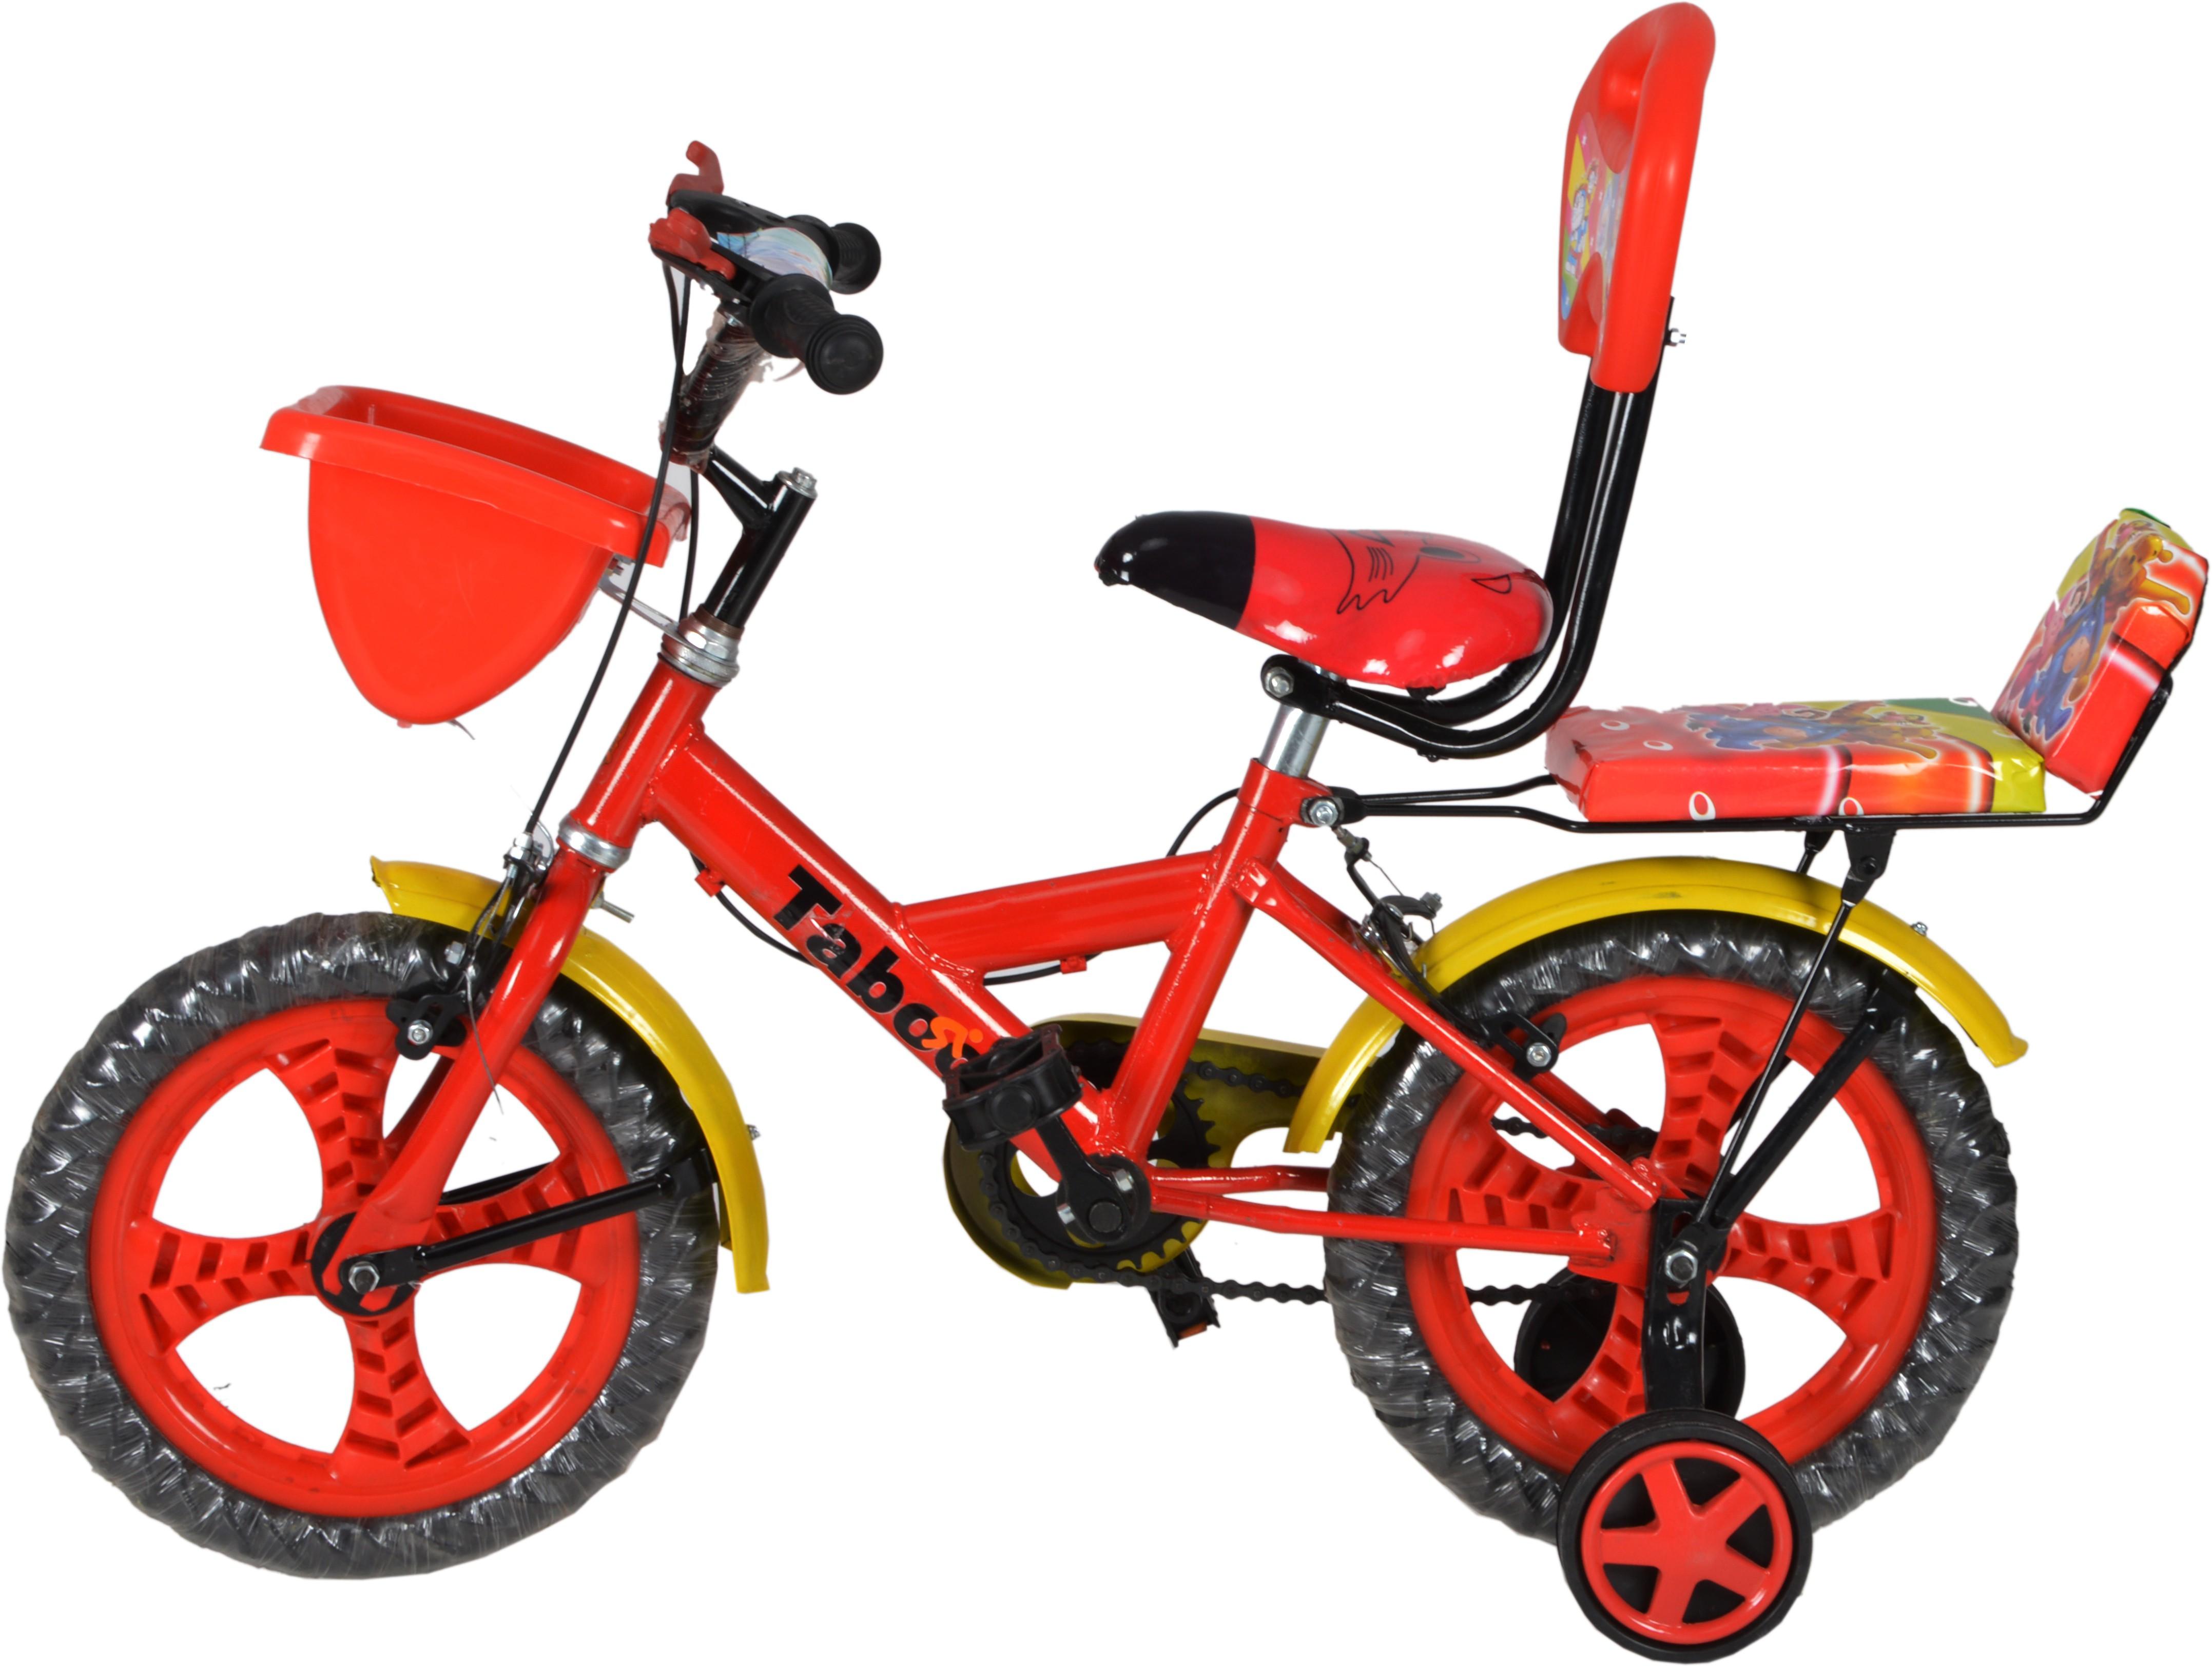 70b6bfcac26 Taboo dabal seat 1818 Road Cycle